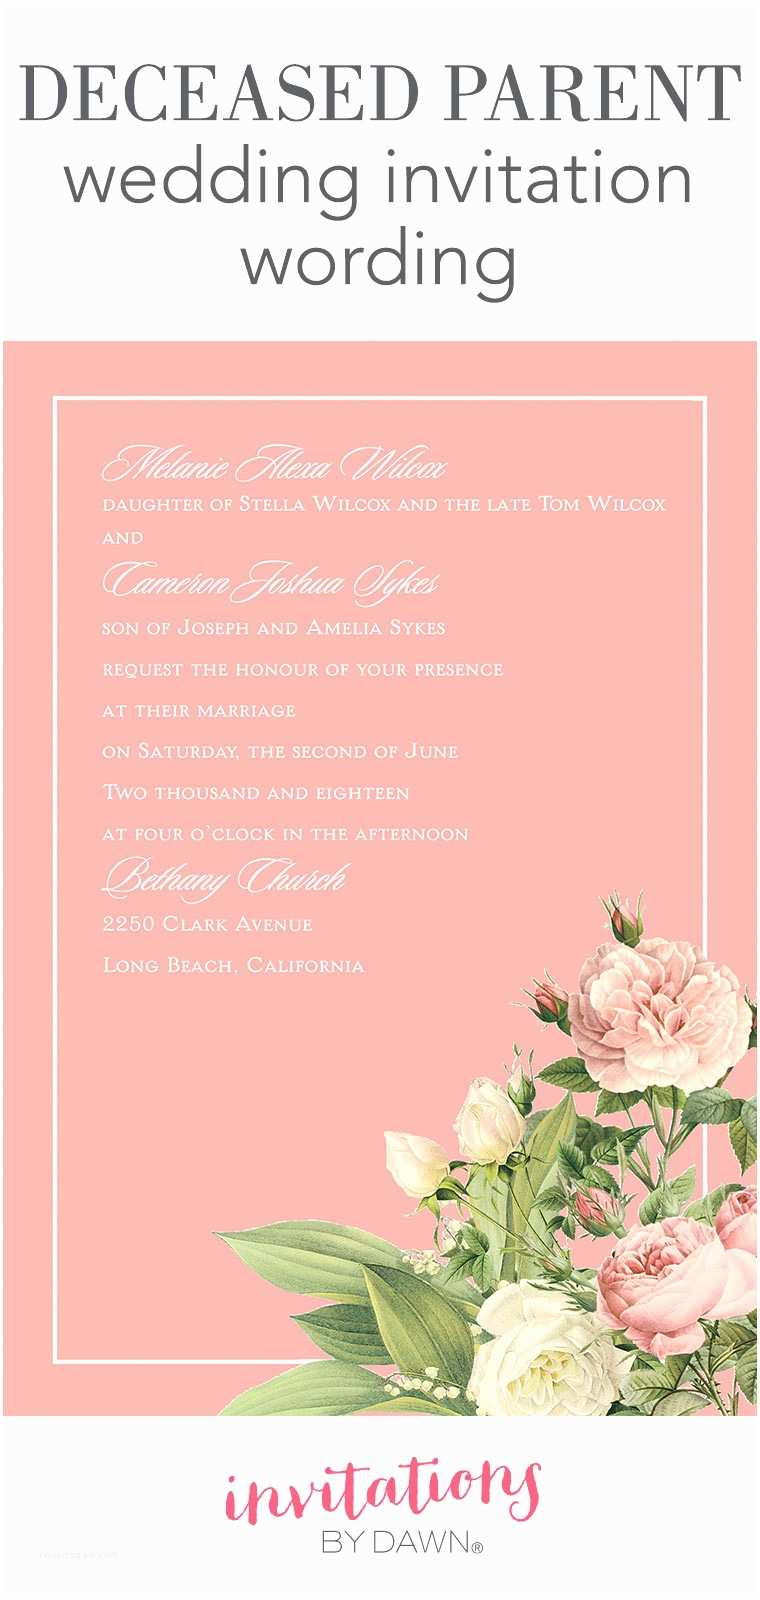 Wedding Invitation Poems Wedding Invitation Wording Samples with Deceased Parent